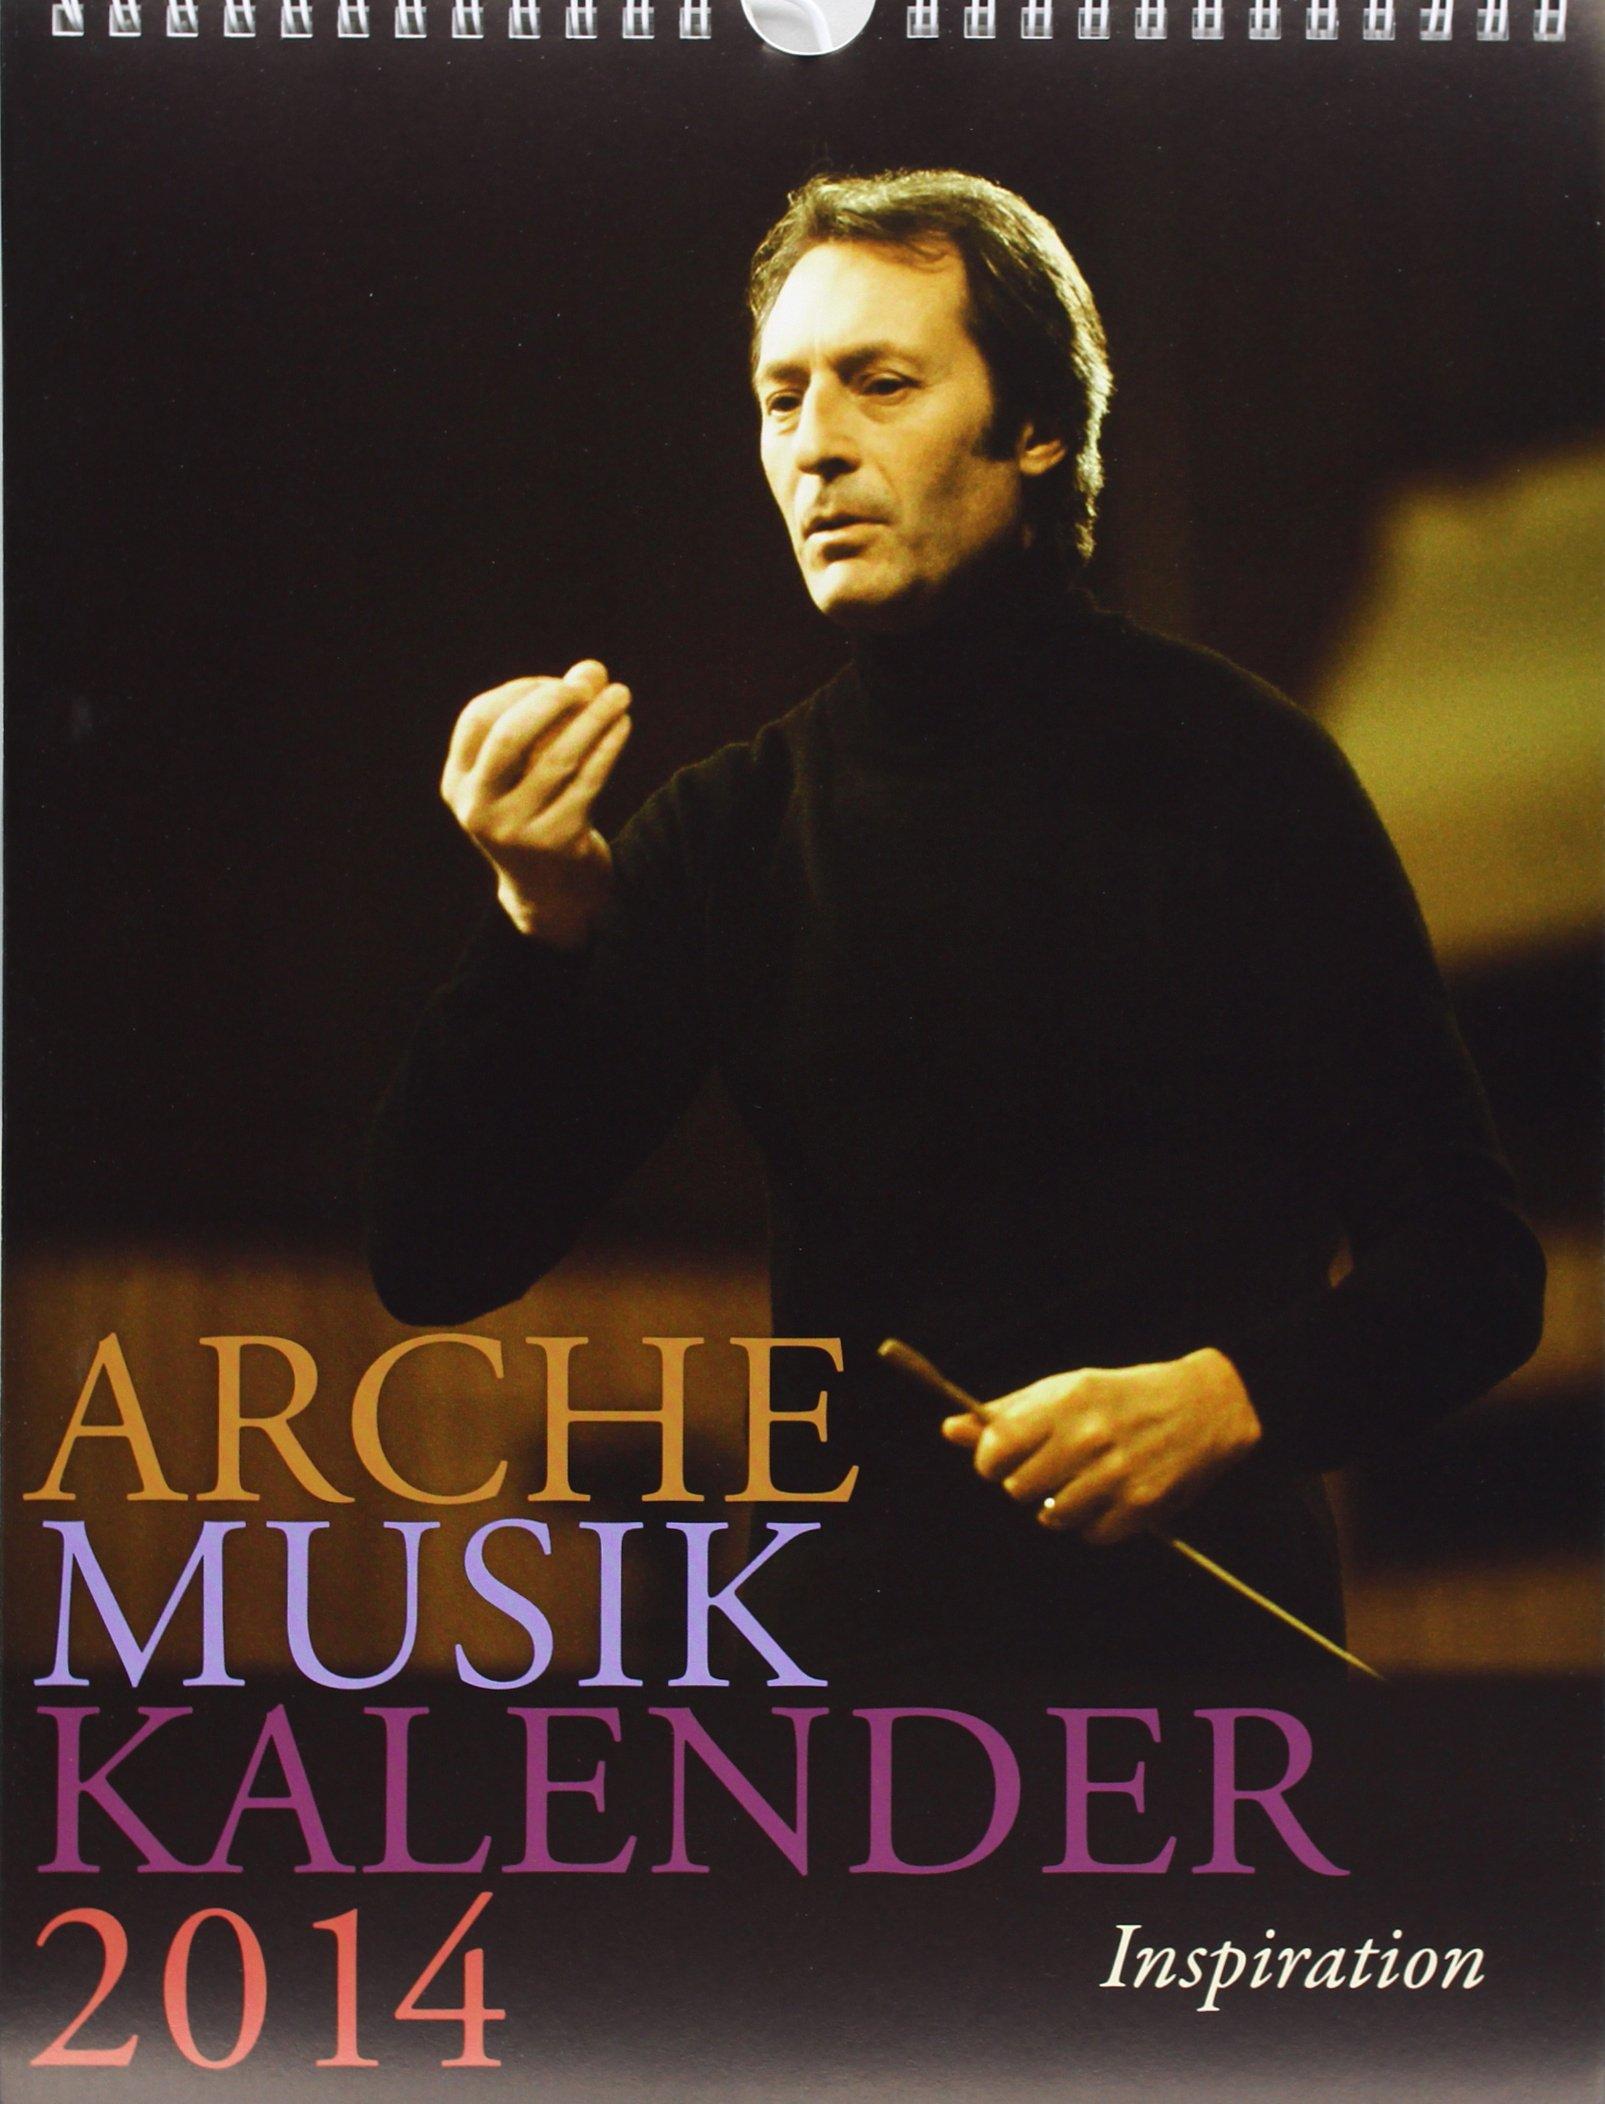 arche-musik-kalender-2014-thema-inspiration